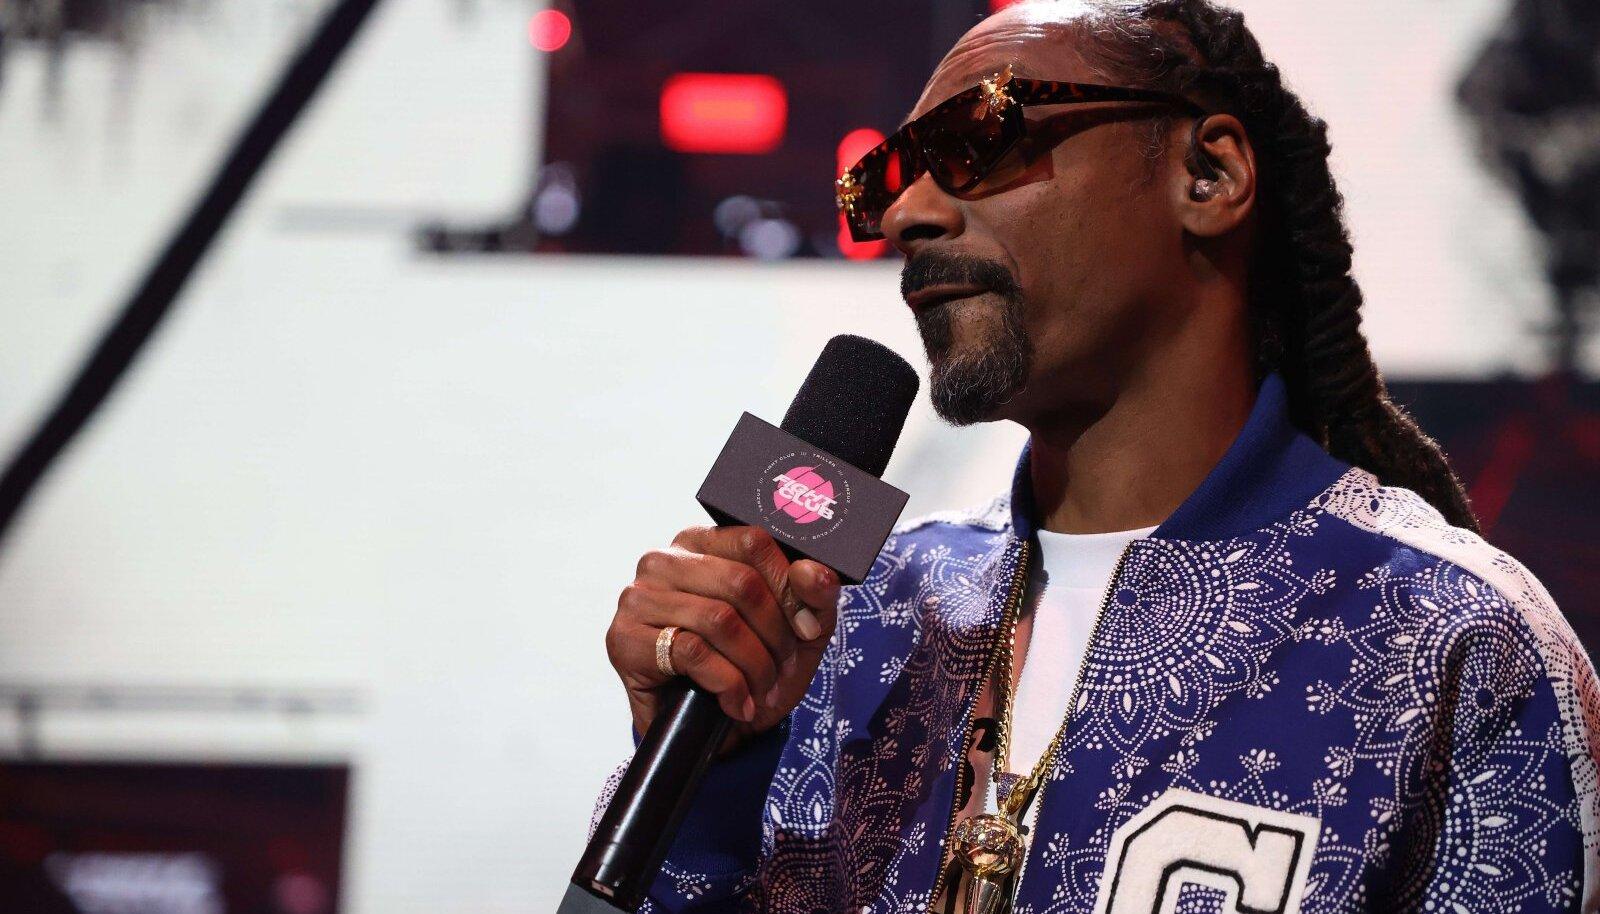 Snoop Dogg osales OCT rahastamises